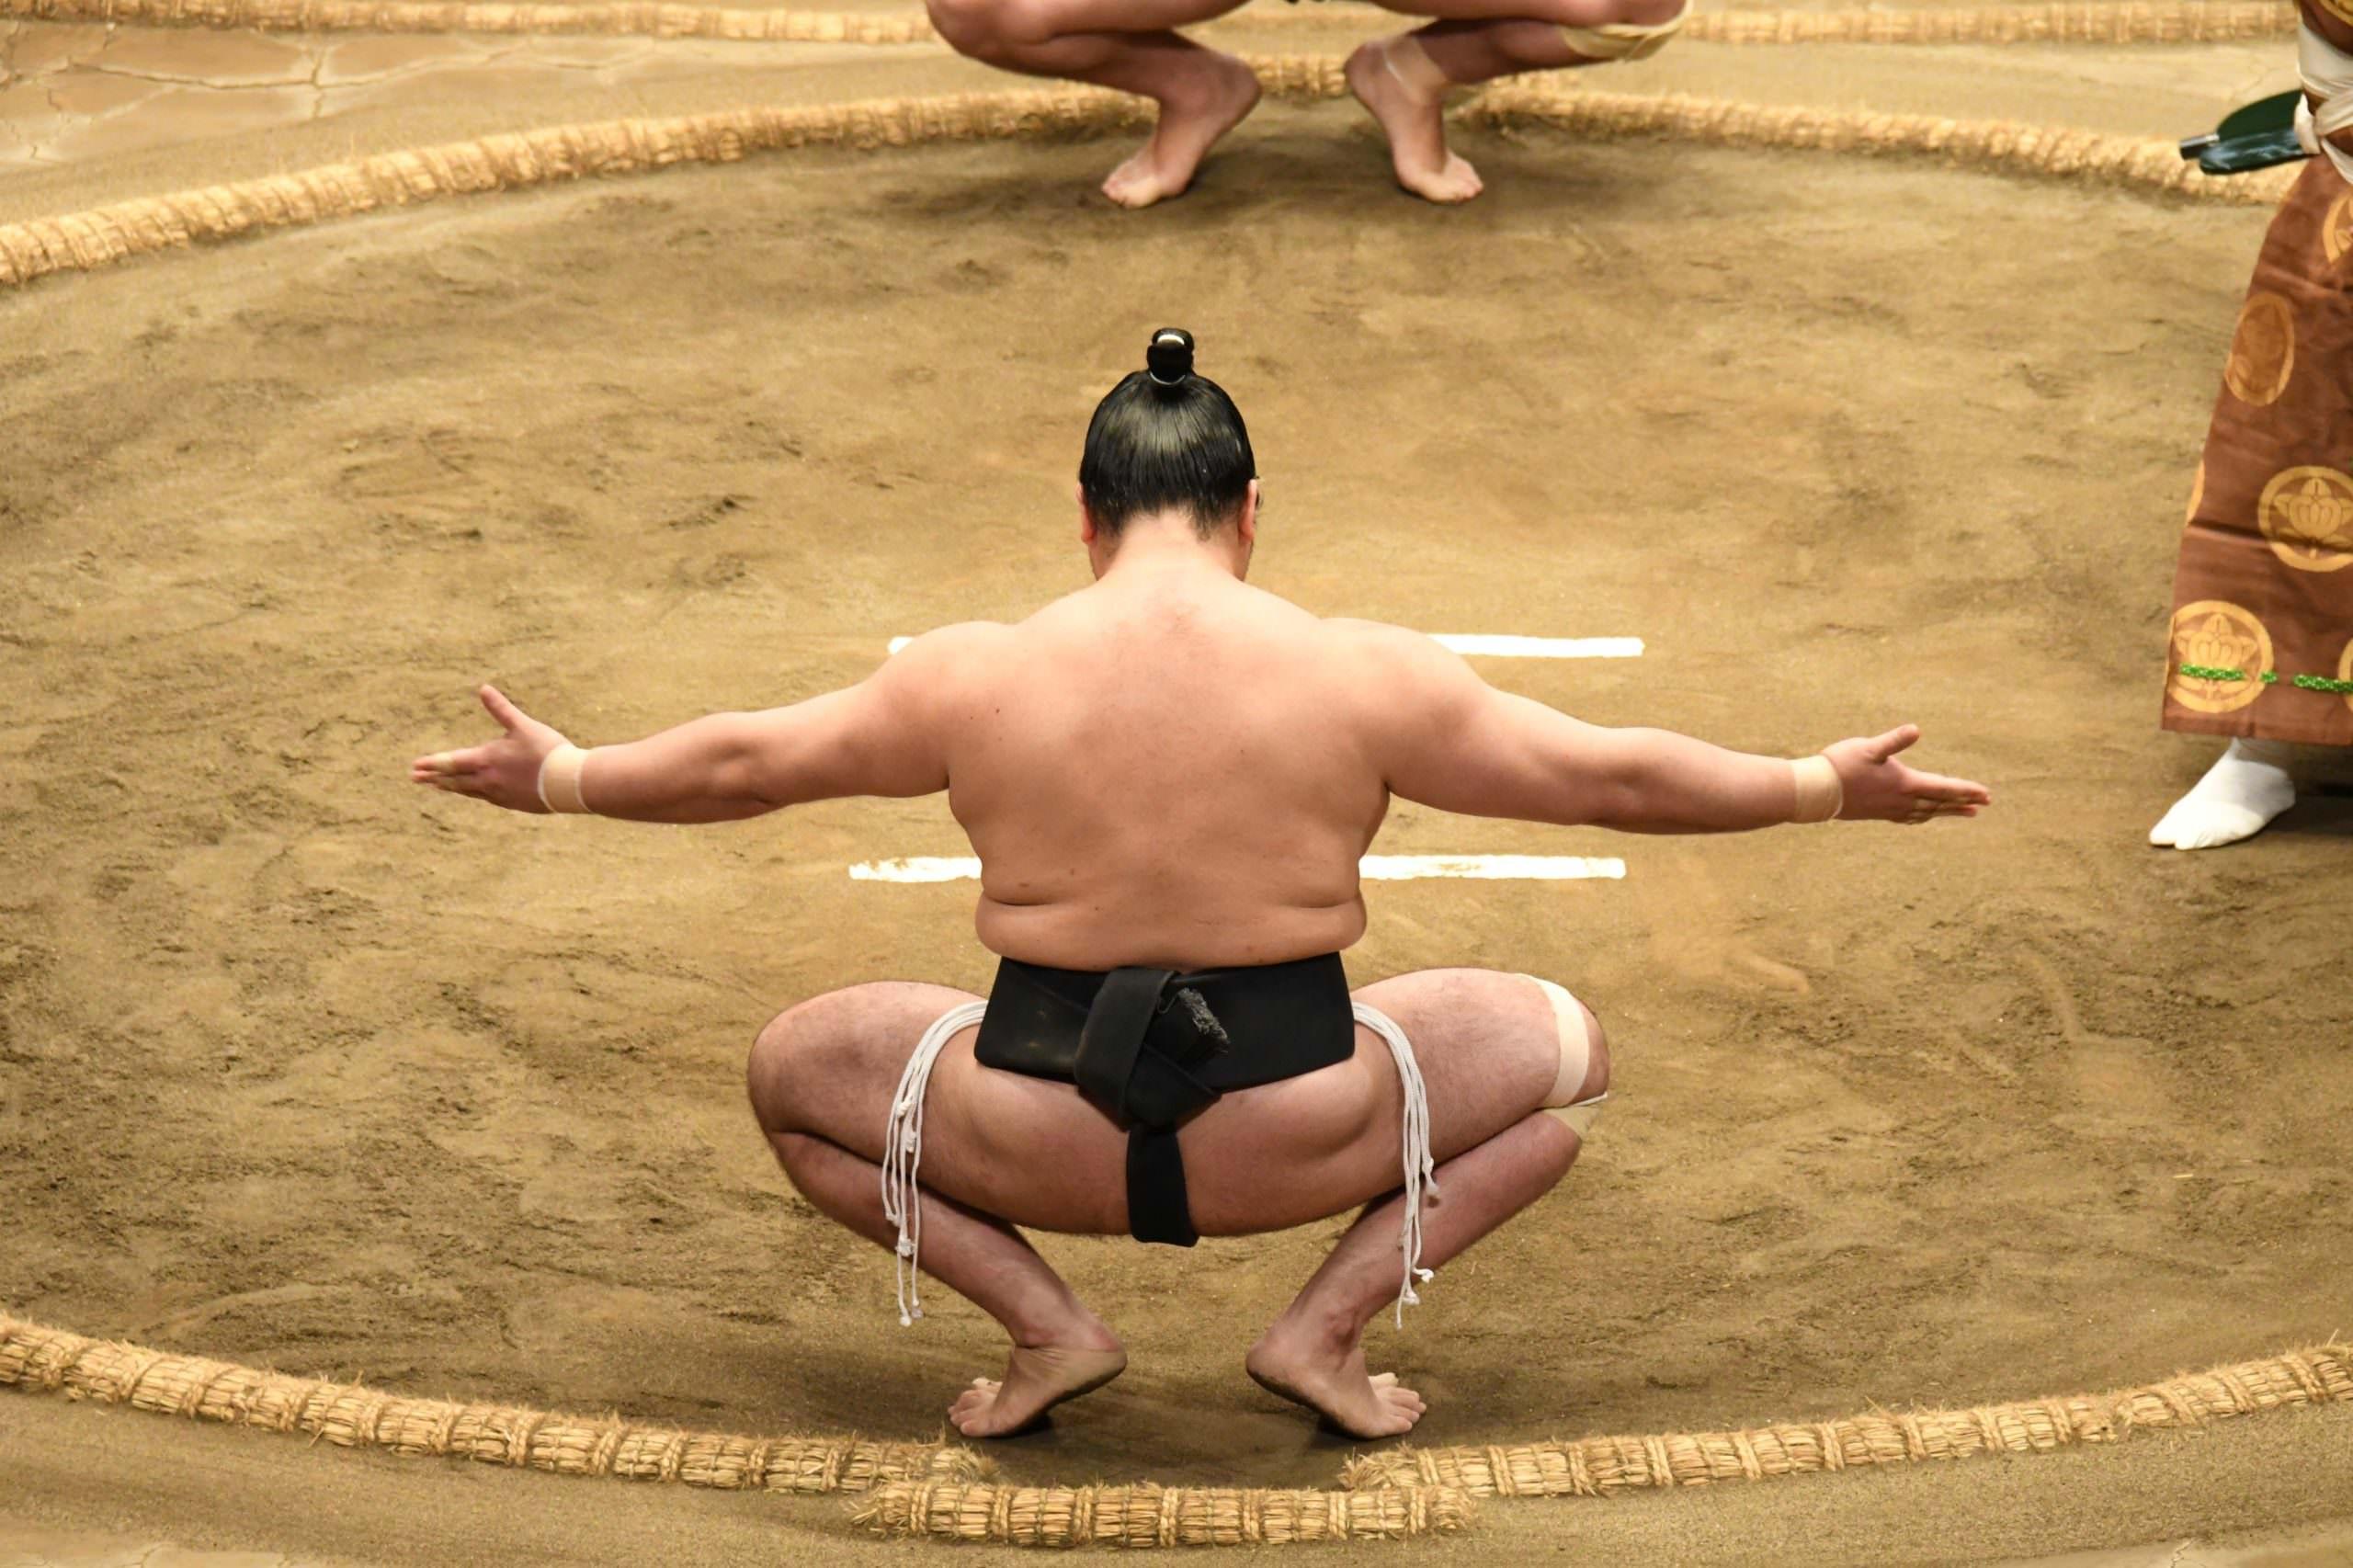 Sumo: Behind the Scenes